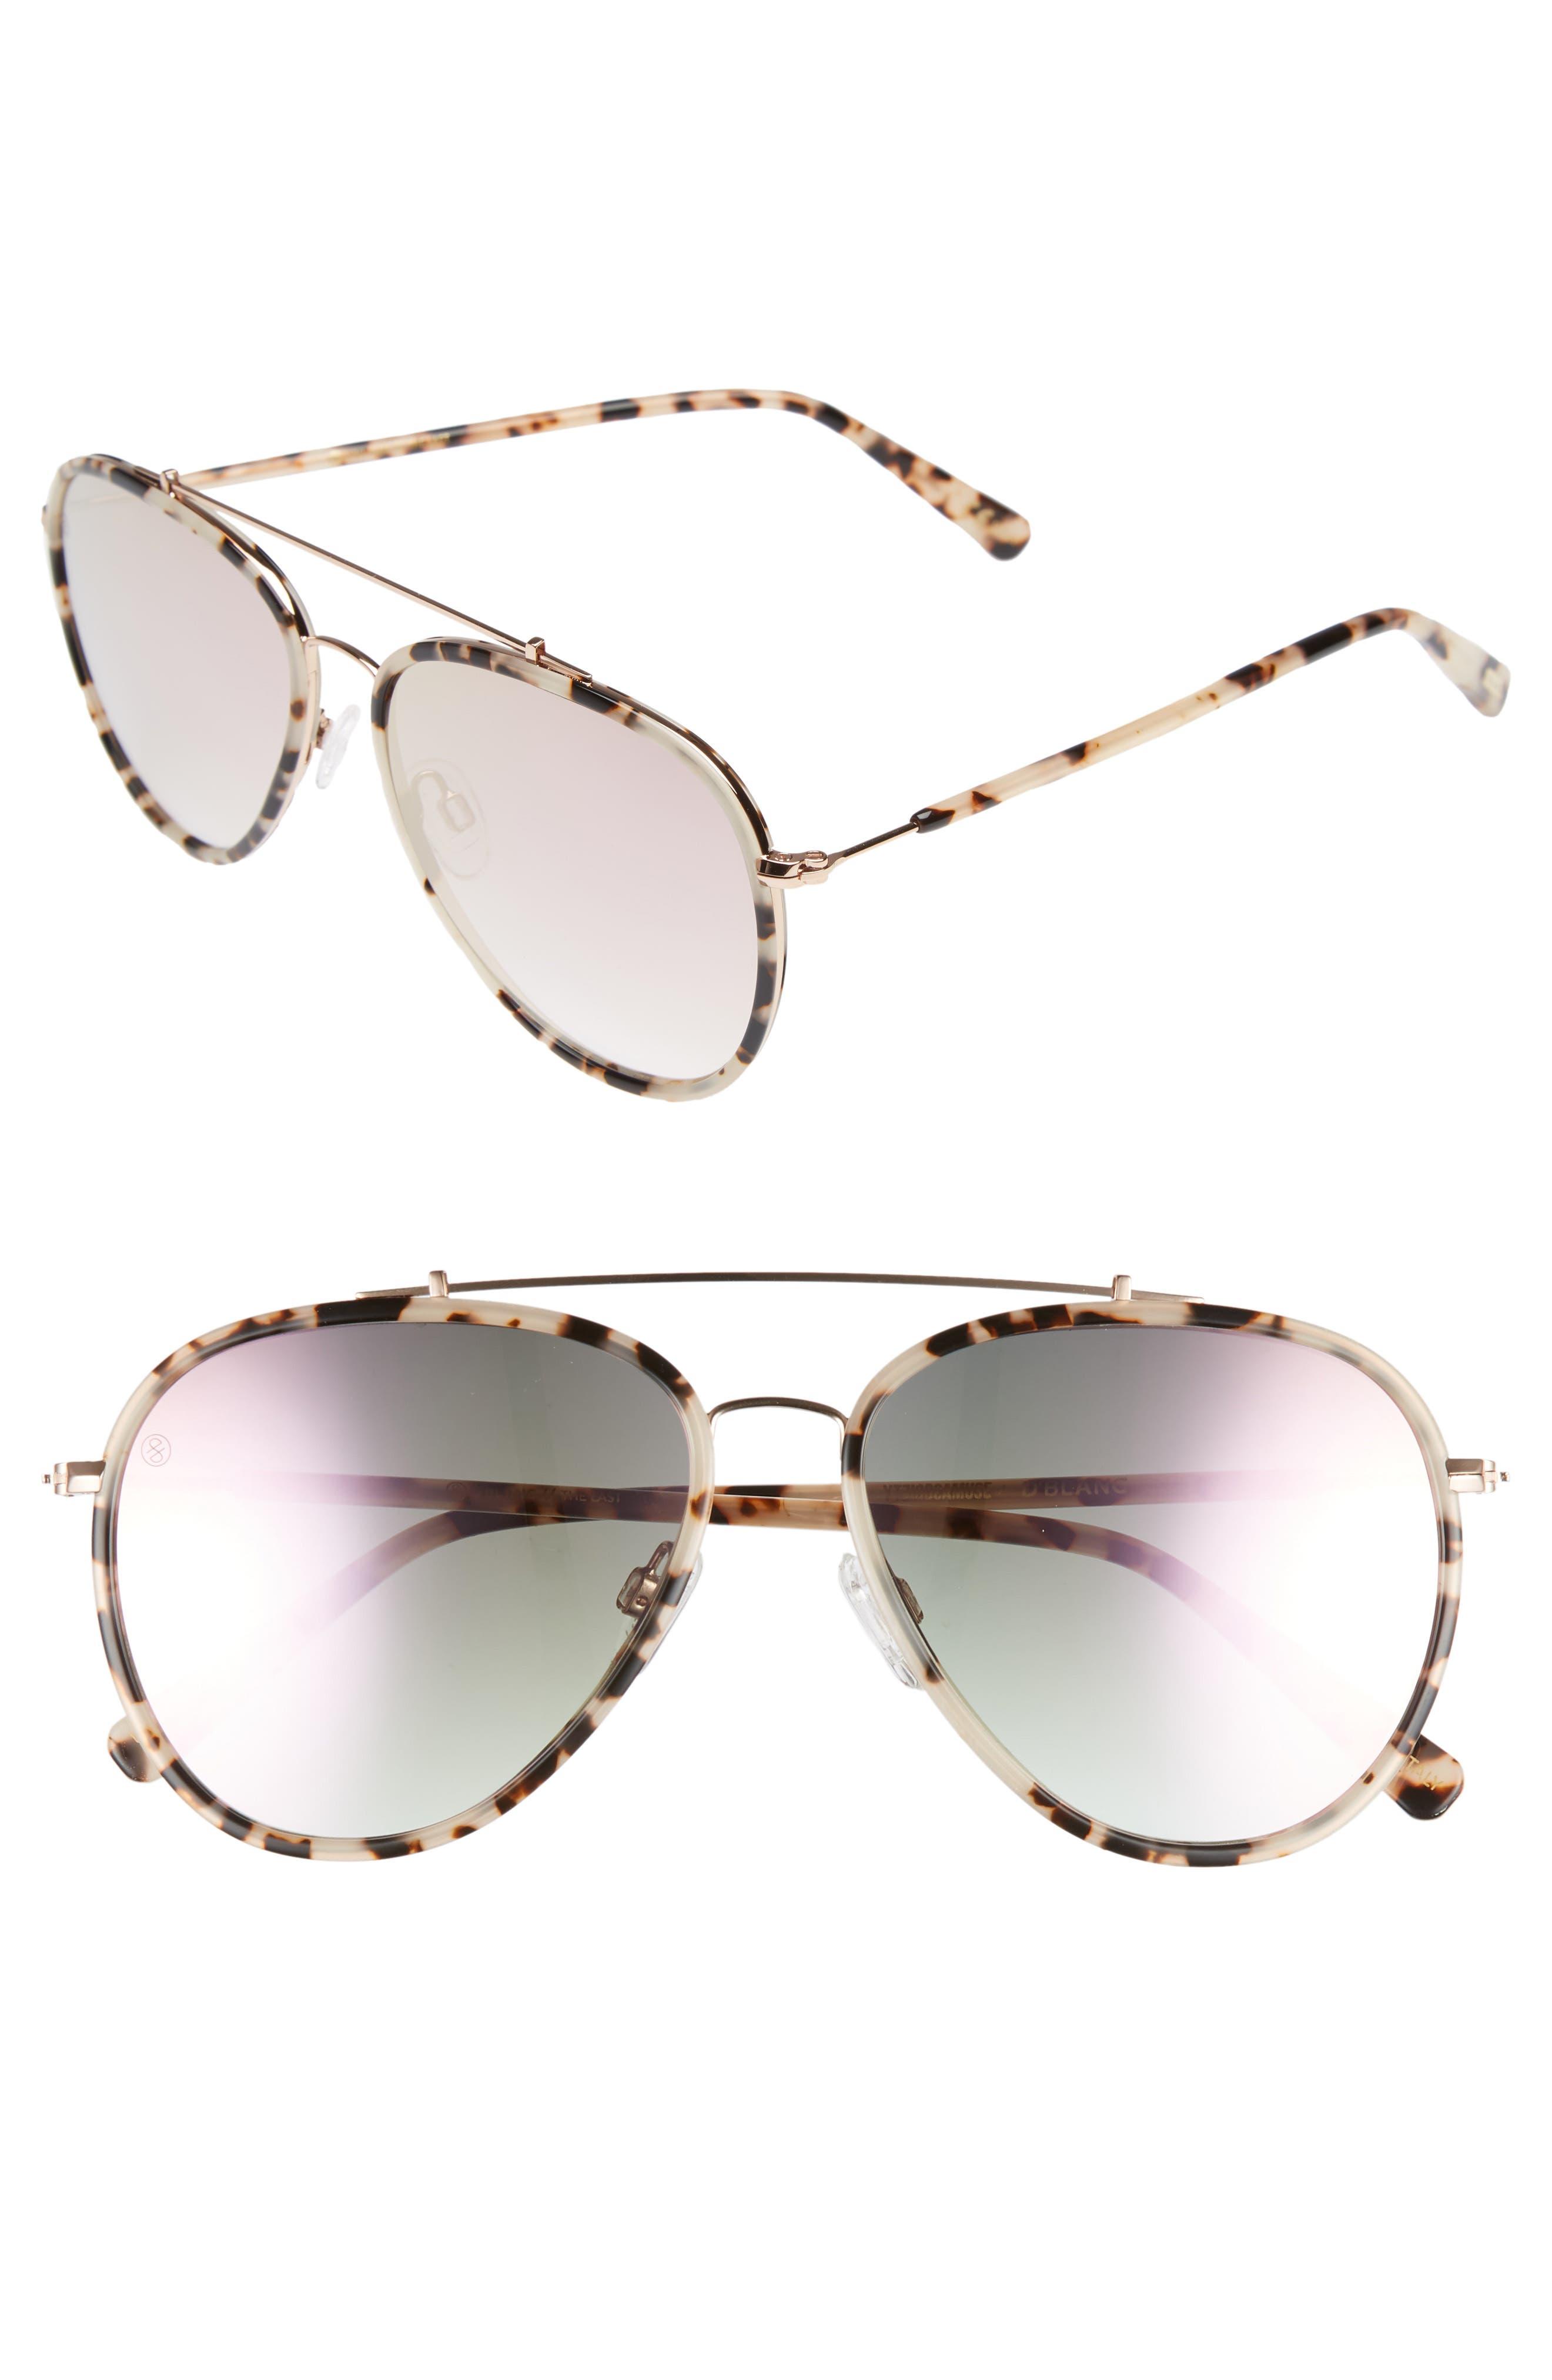 D'BLANC The Last 57mm Aviator Sunglasses,                             Main thumbnail 1, color,                             200